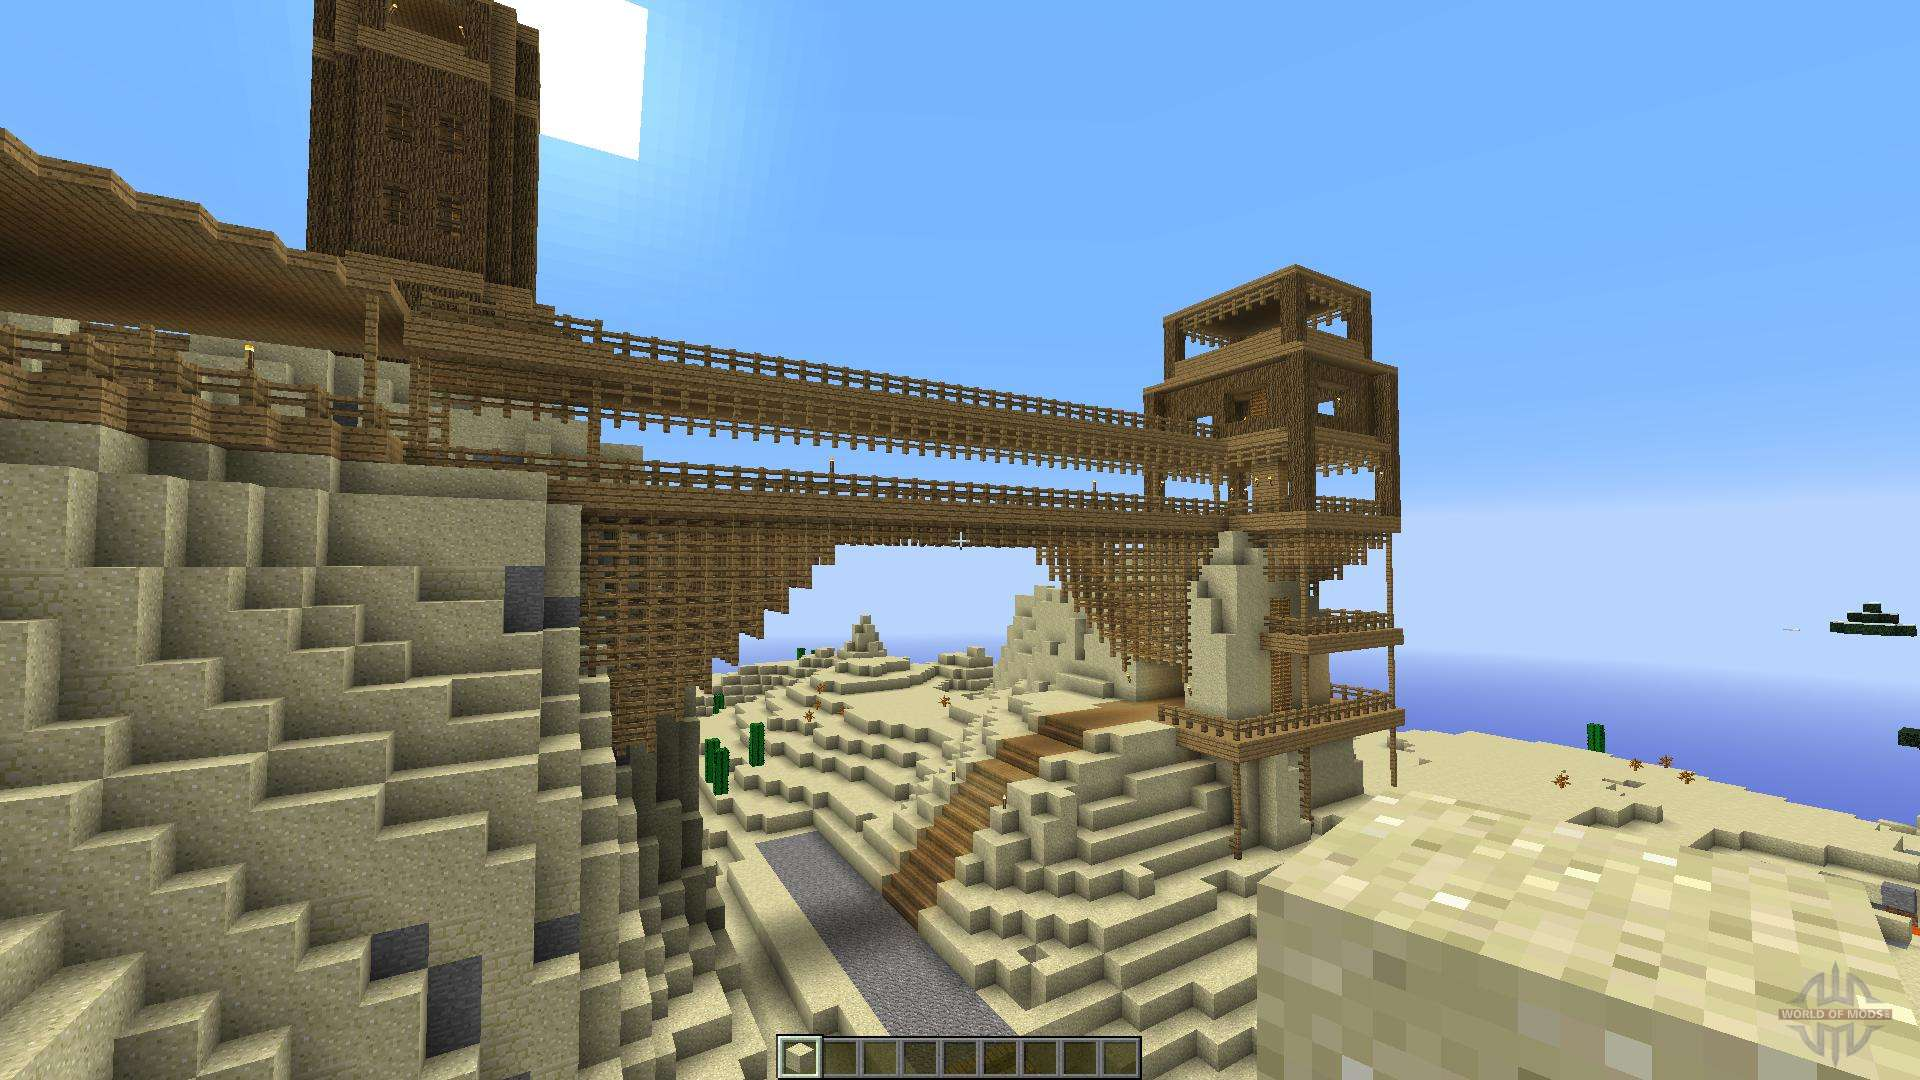 Minecraft City Map For 1 7 10 - Muat Turun z